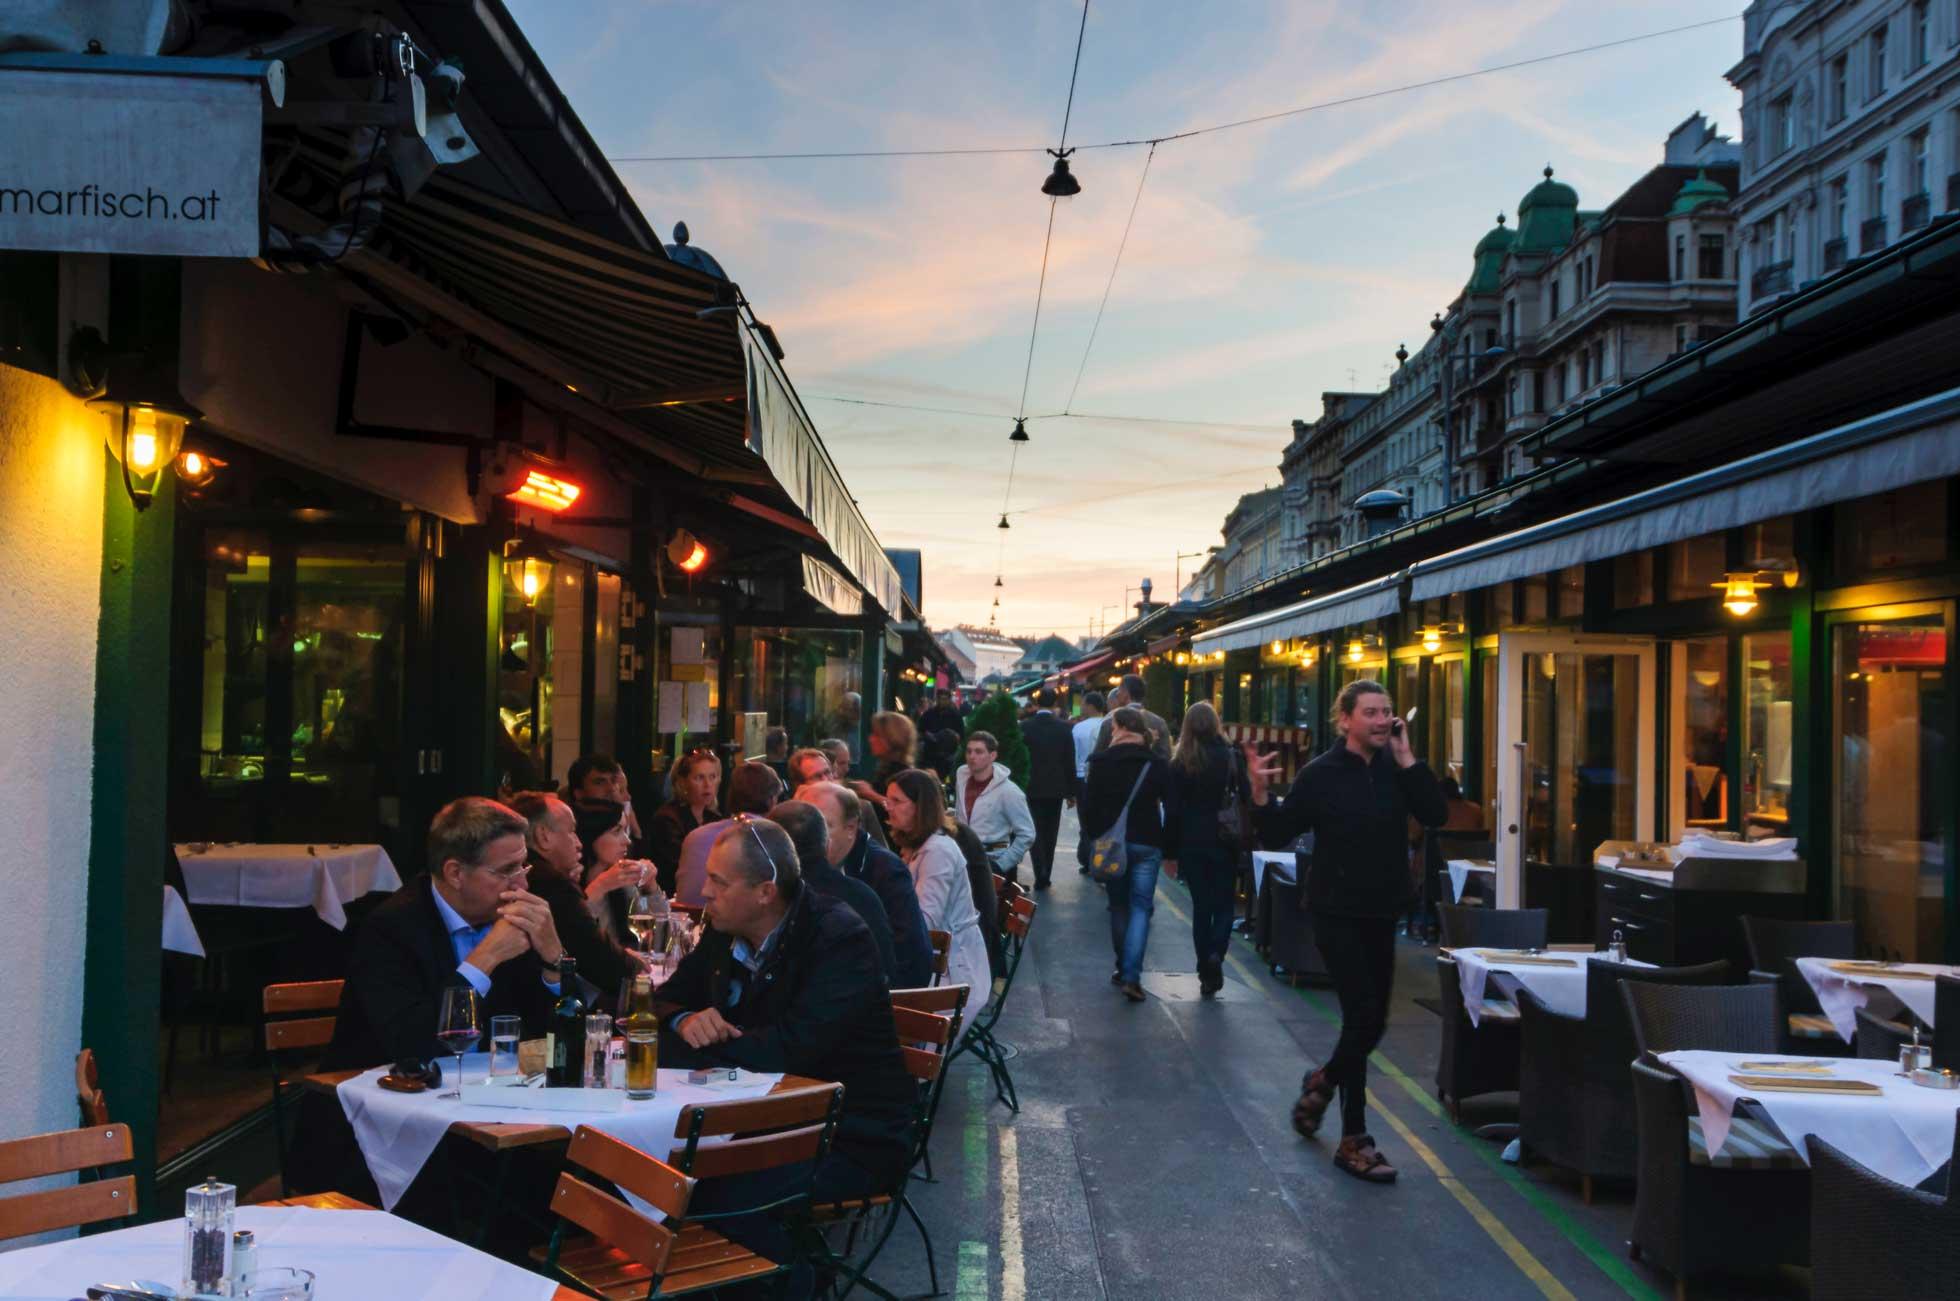 Kvällsliv med uterestauranger under konferensresan till Wien Österrike